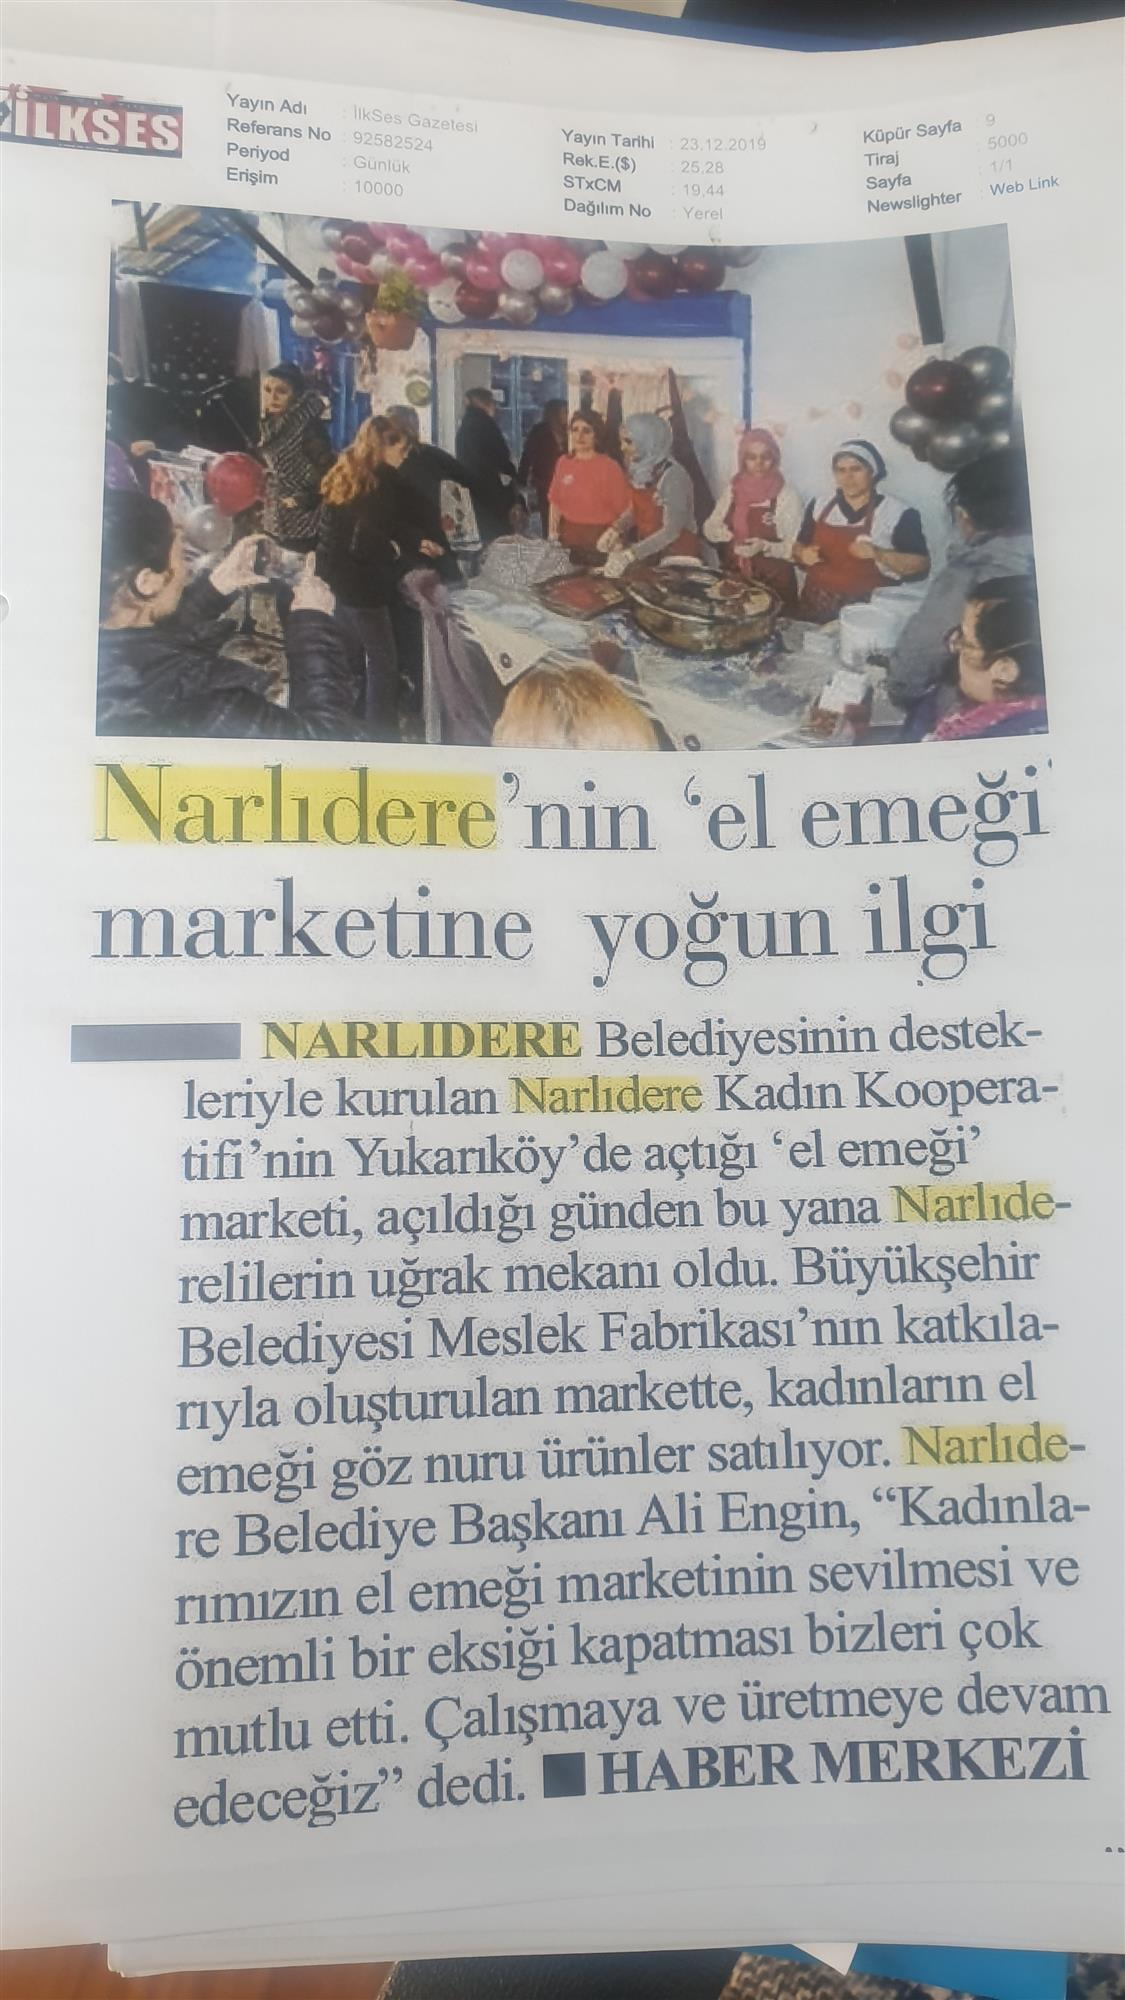 gazete-haberleri202012816410844